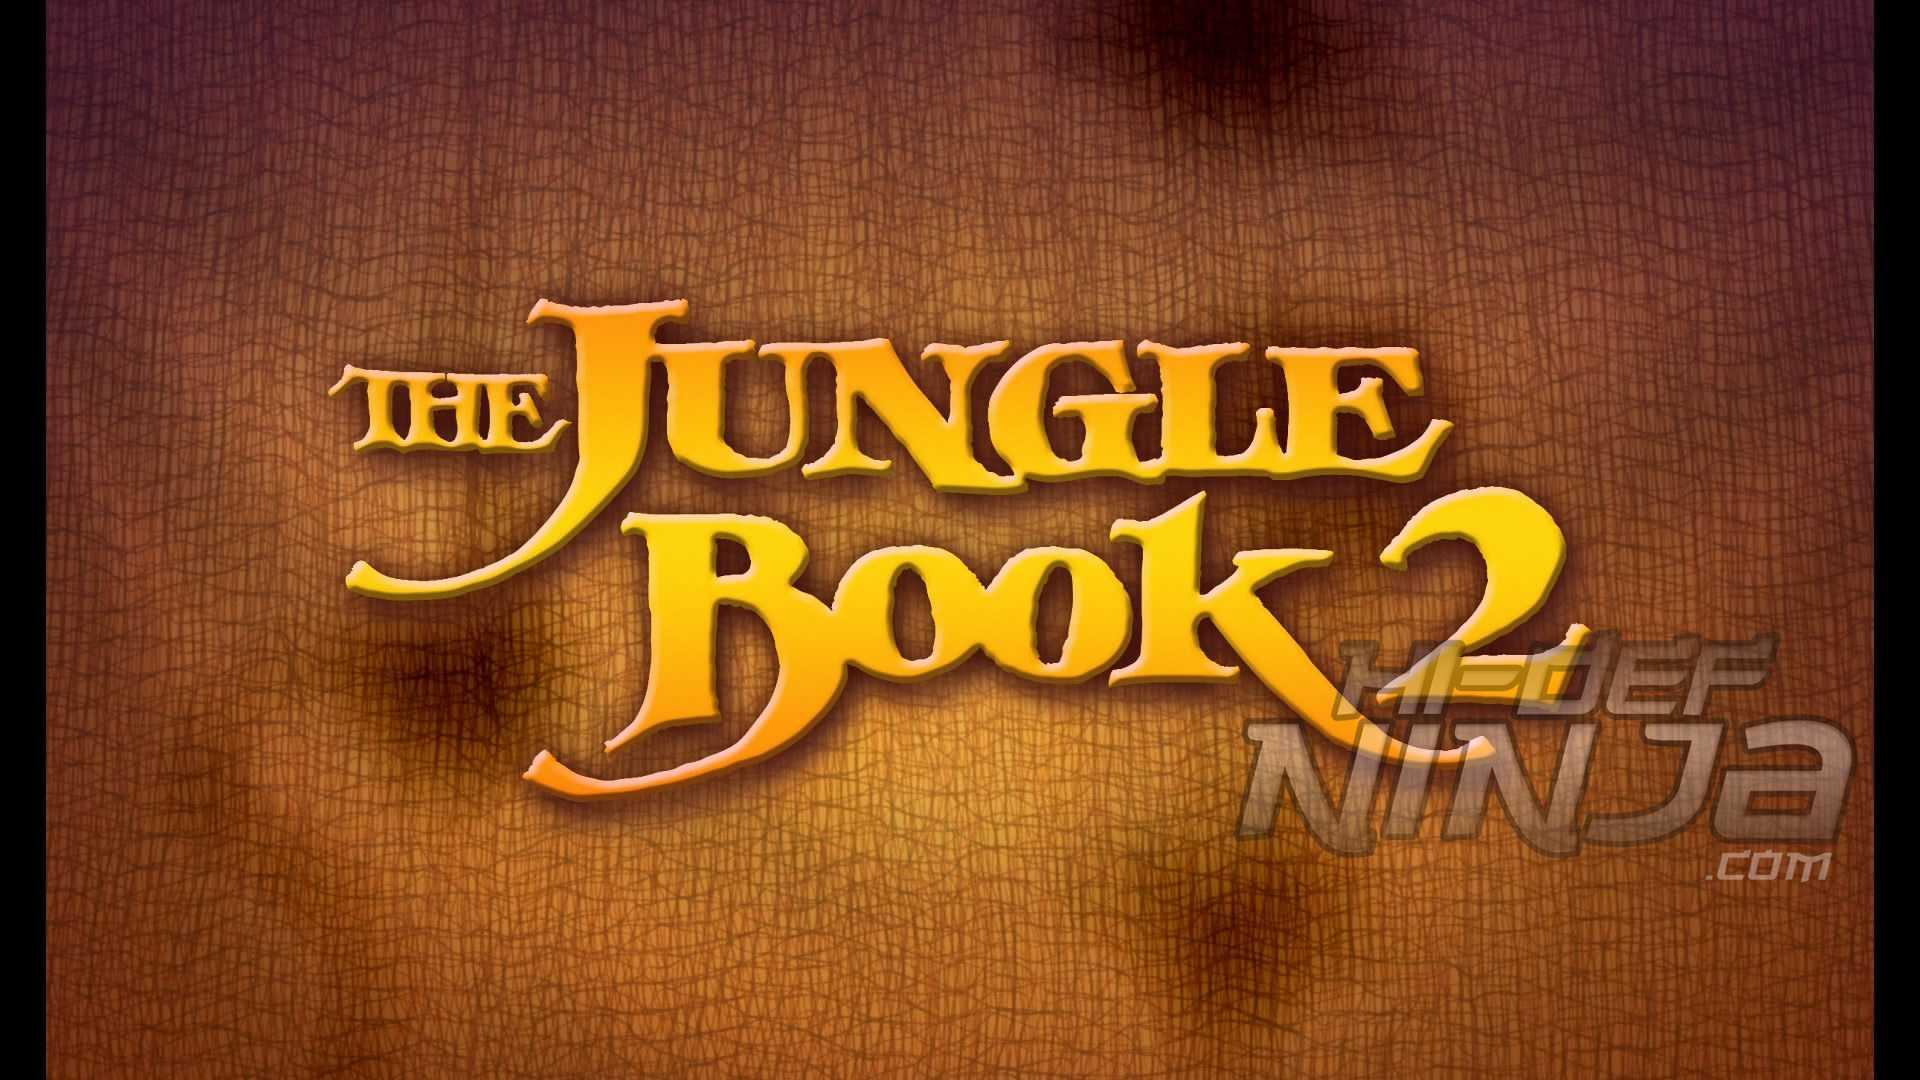 TheJungleBook2-1